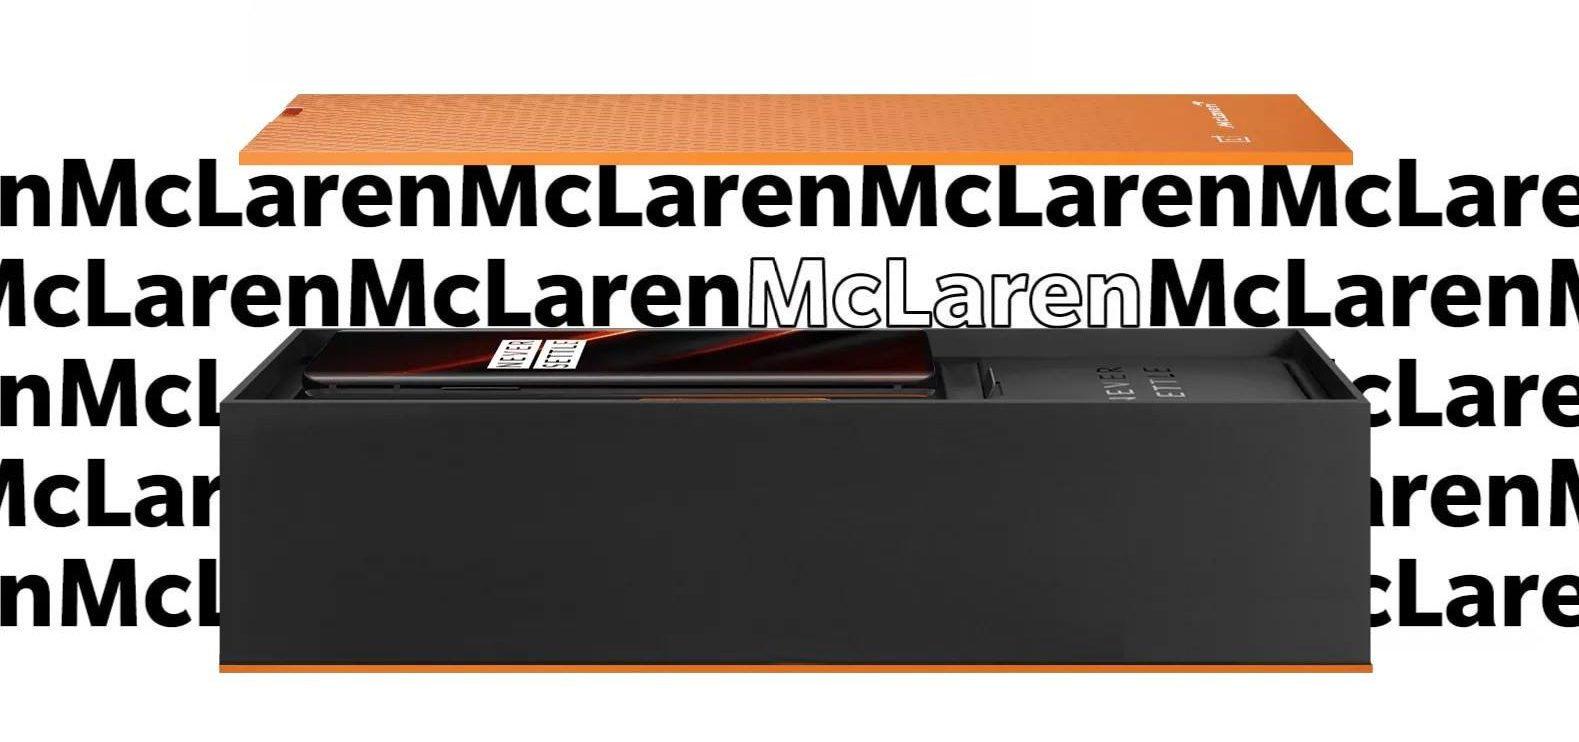 OnePlus 7T Pro 5G McLaren (6)